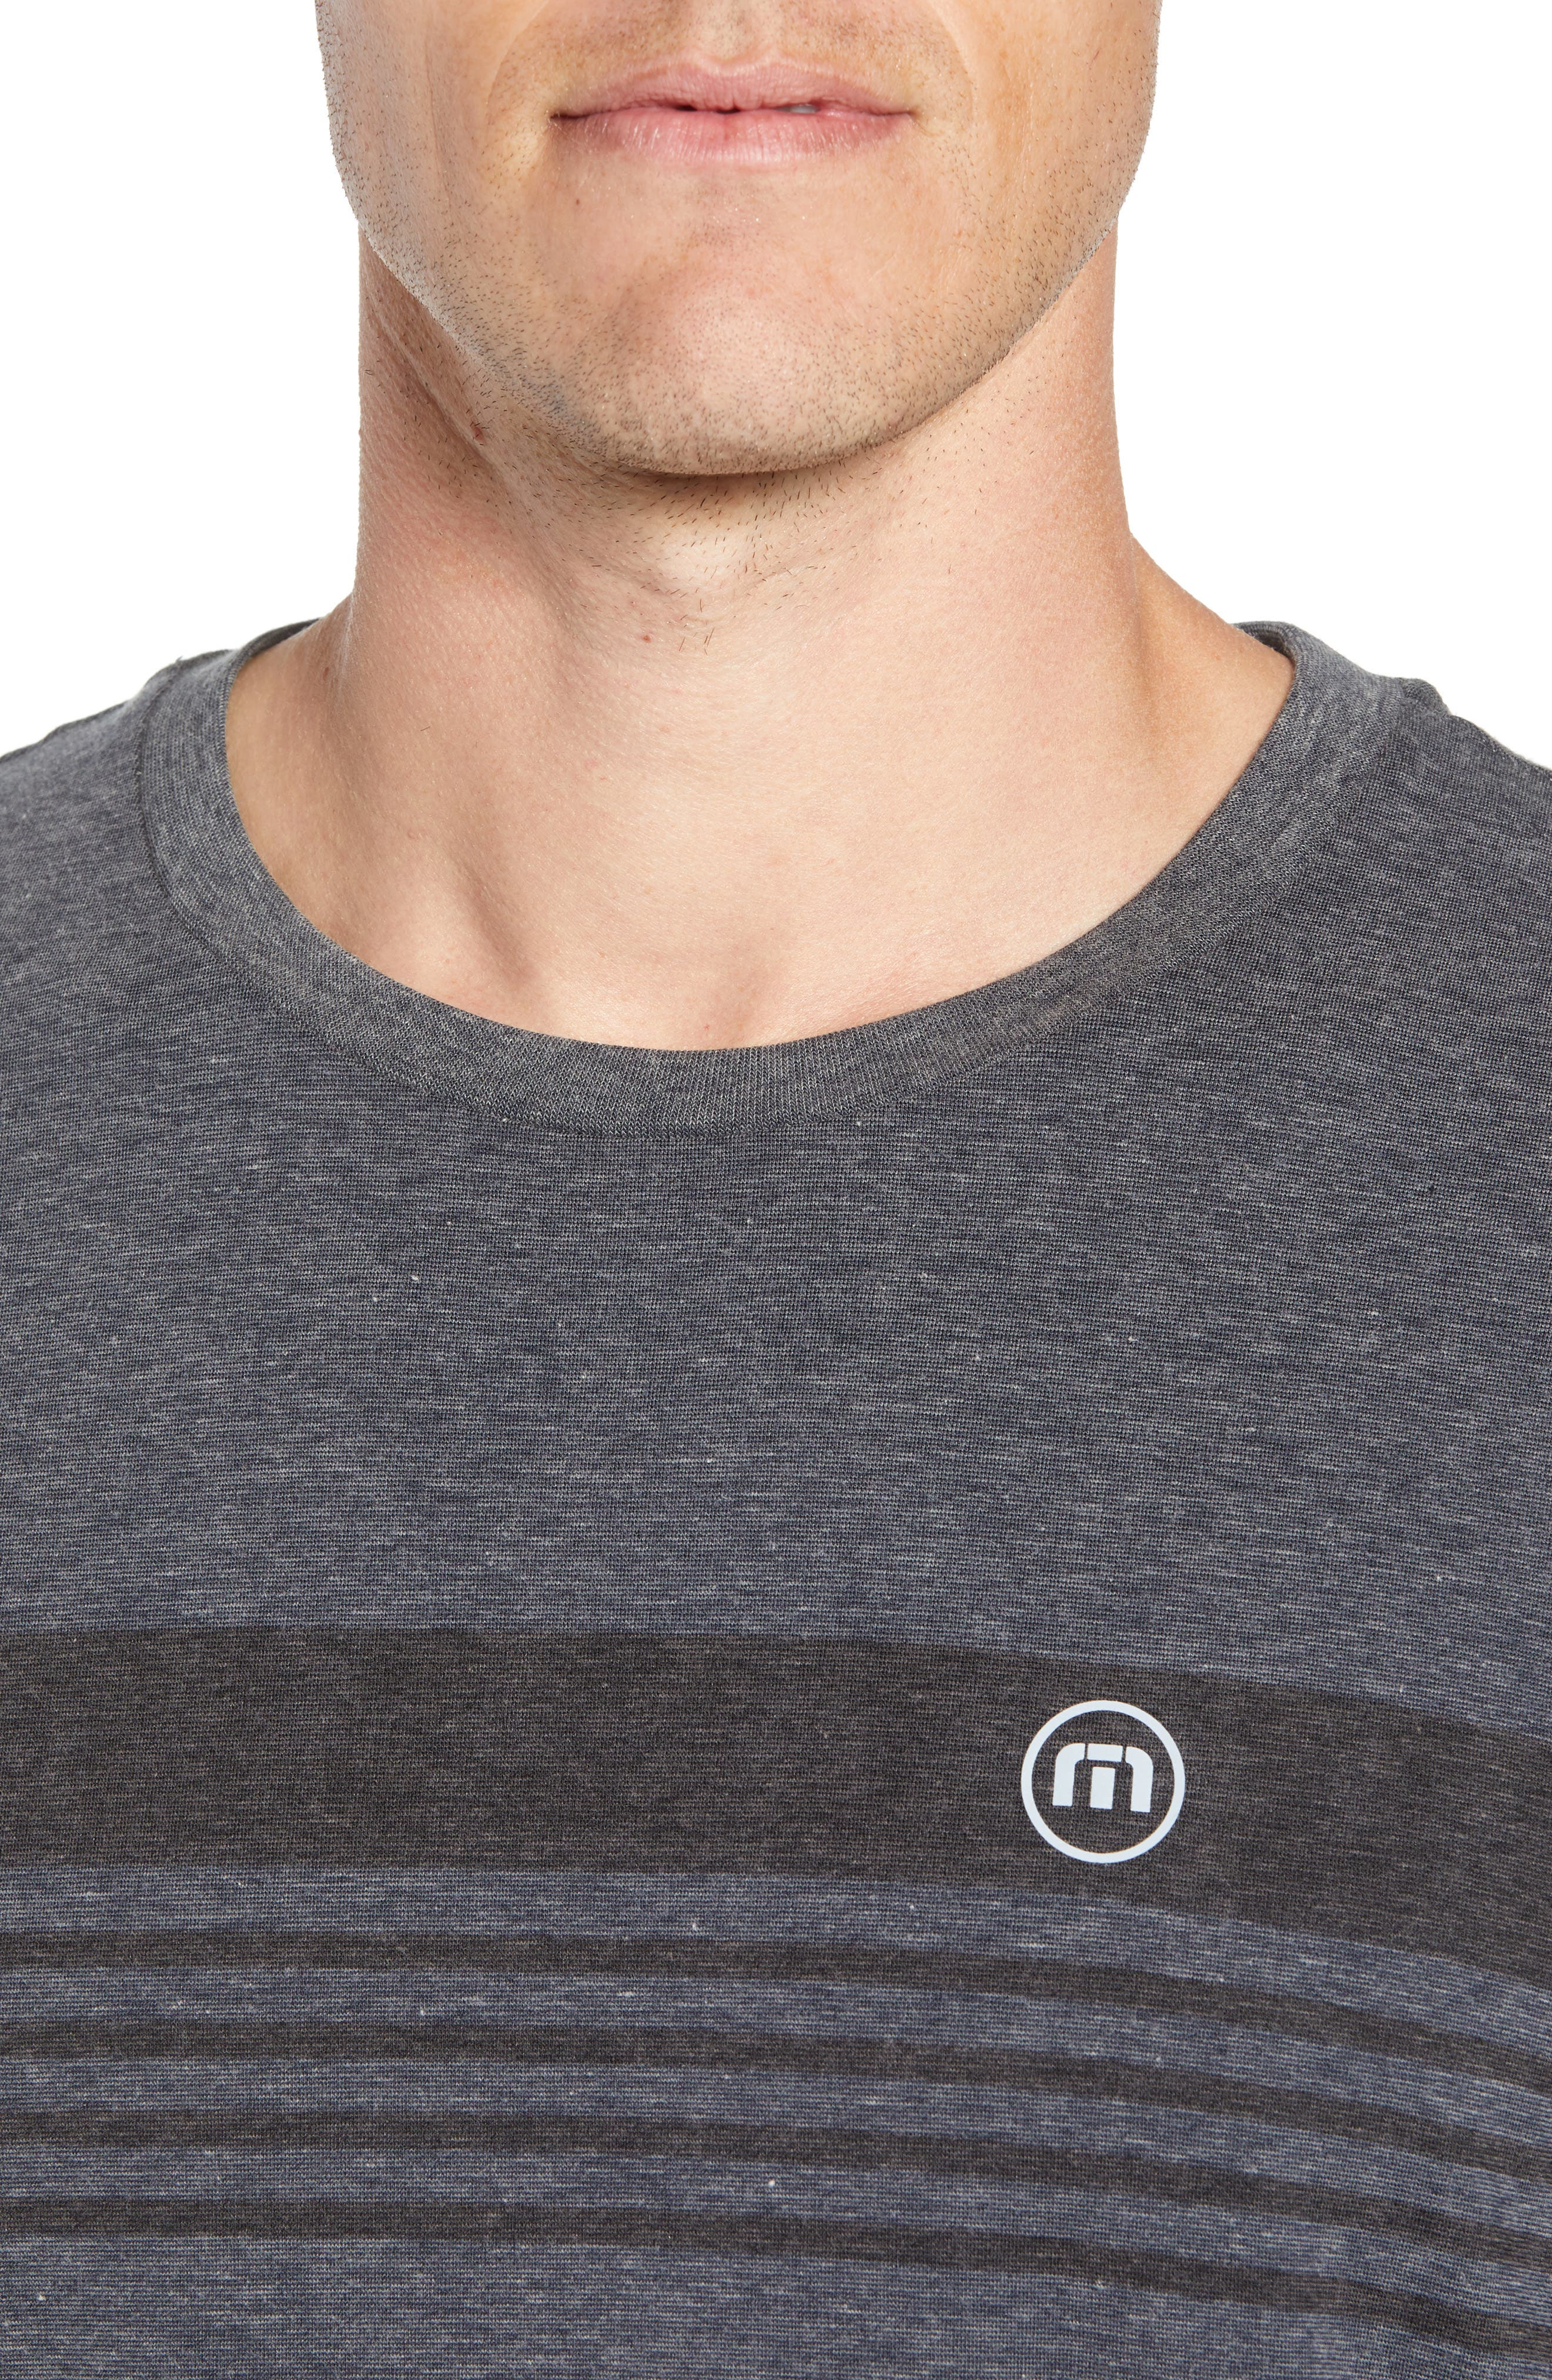 Recline Performance T-Shirt,                             Alternate thumbnail 4, color,                             HEATHER MAGNET